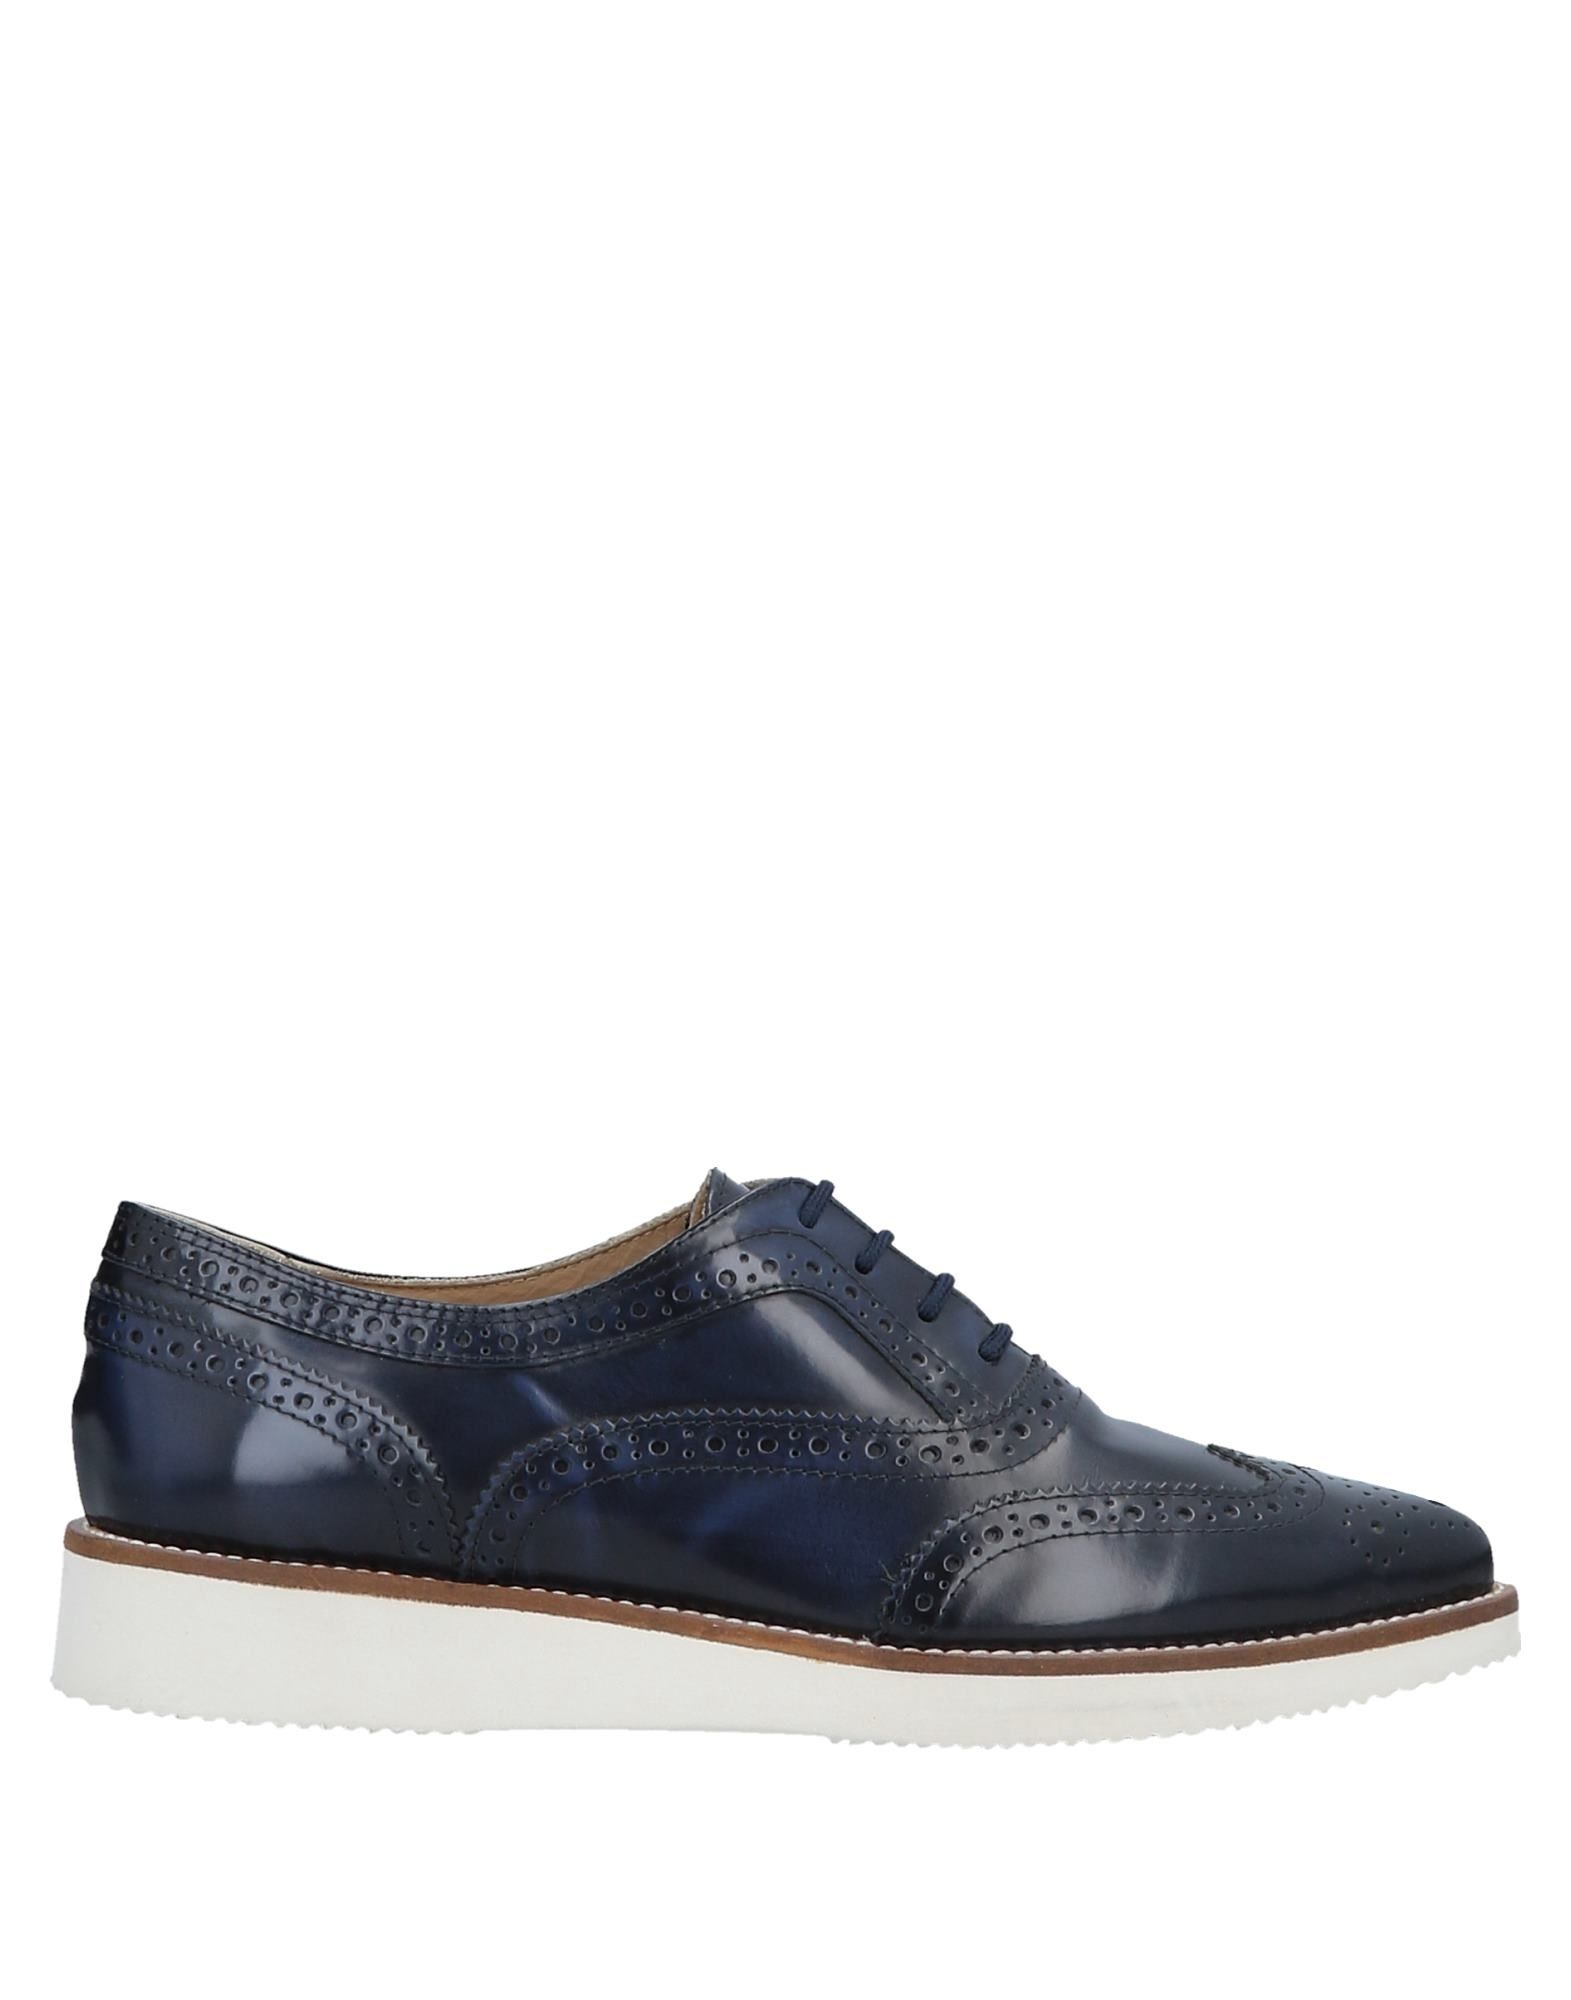 WEEKEND MAX MARA Обувь на шнурках max limit обувь на шнурках